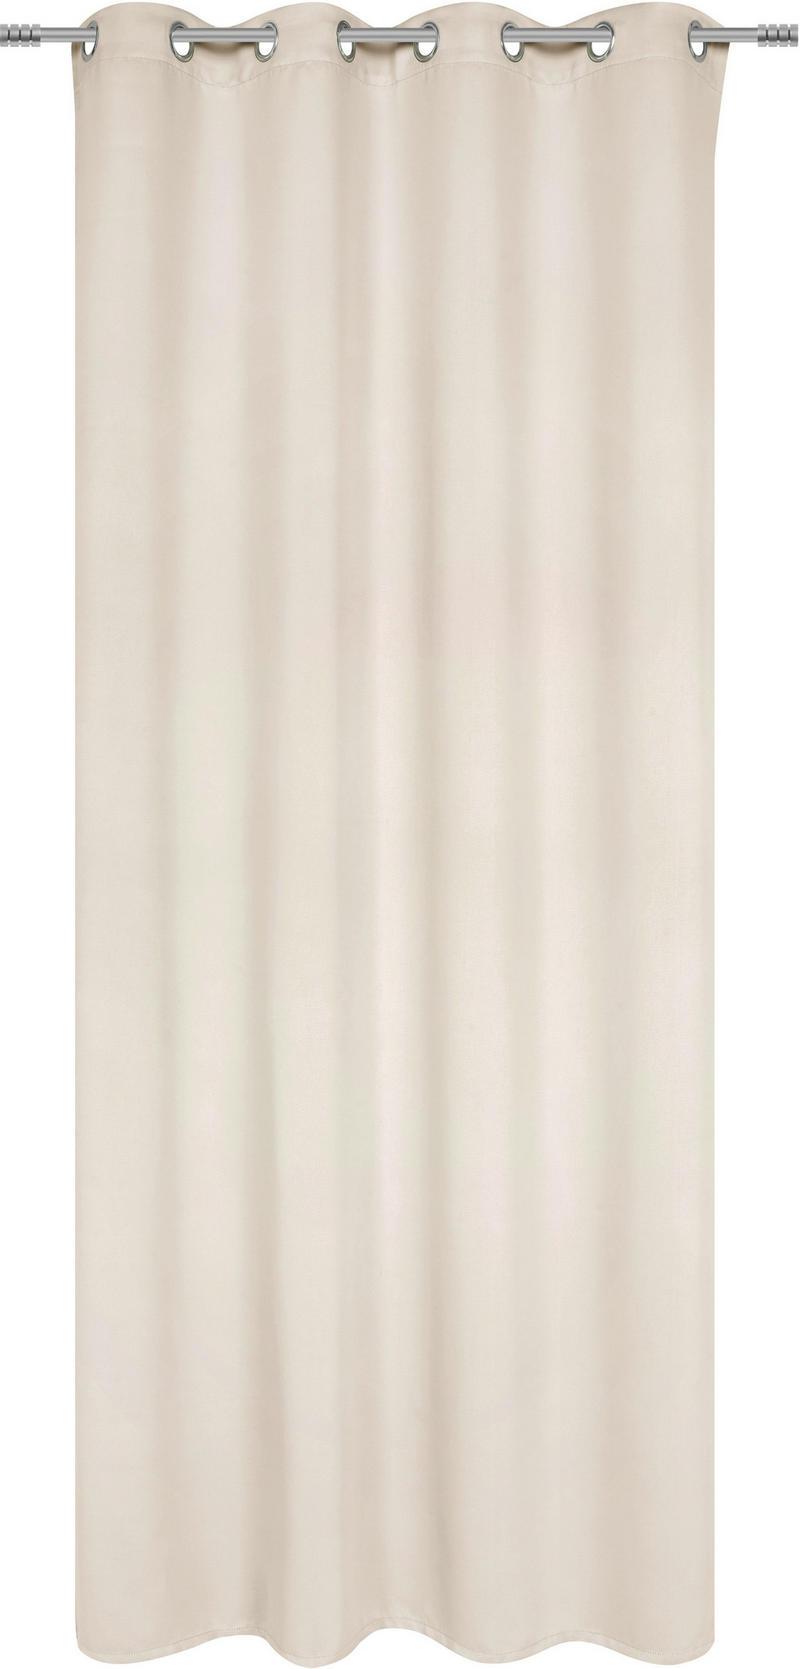 ÖLJETTLÄNGD - champagne, Basics, textil (140/245cm) - Esposa